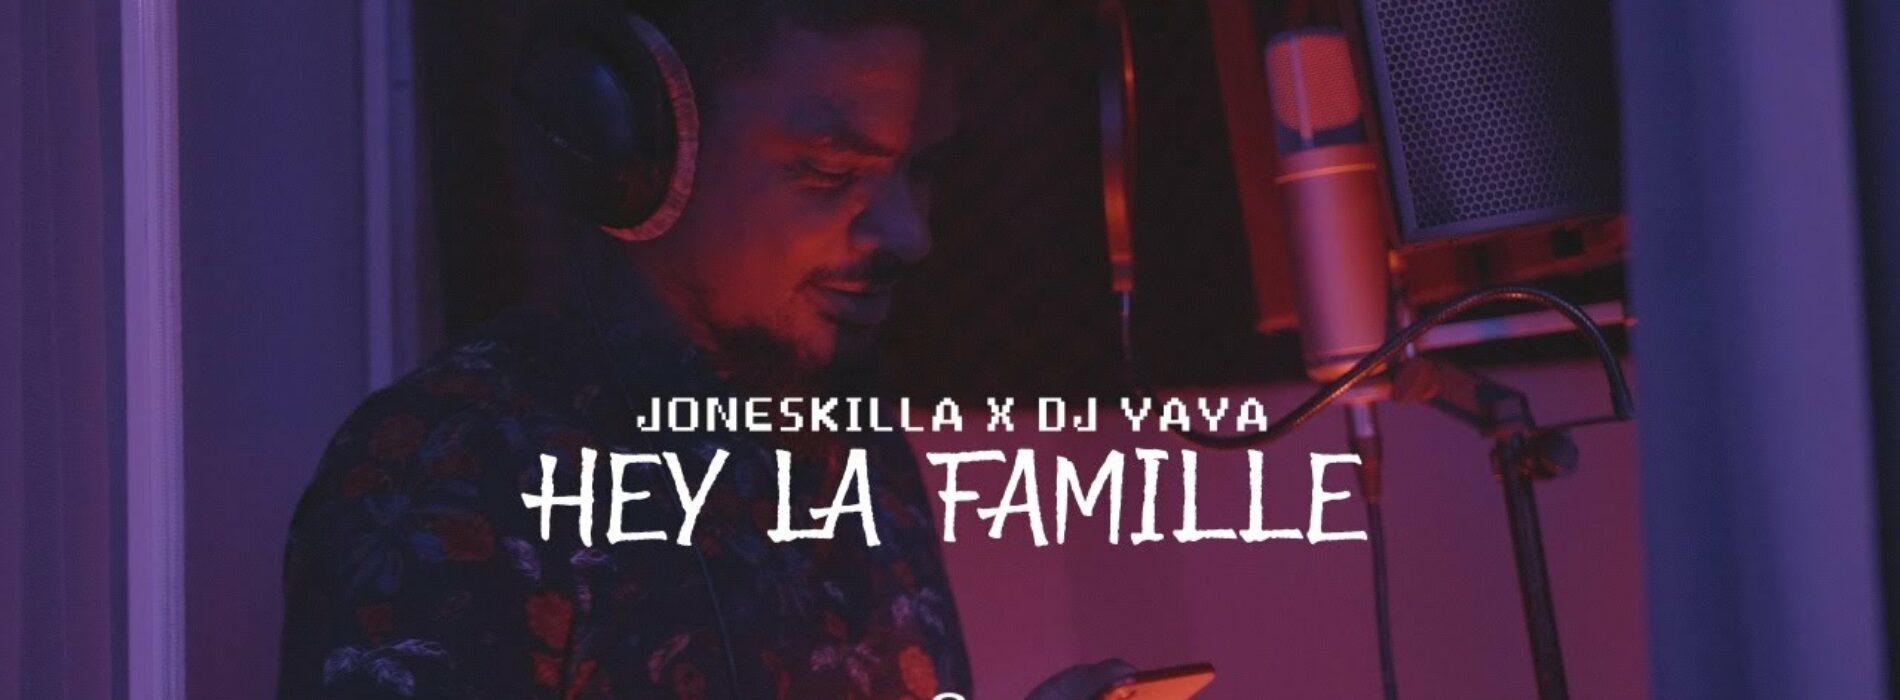 Joneskilla Feat Dj Yaya – Hey La Famille (Les Métisses) – Juin 2021